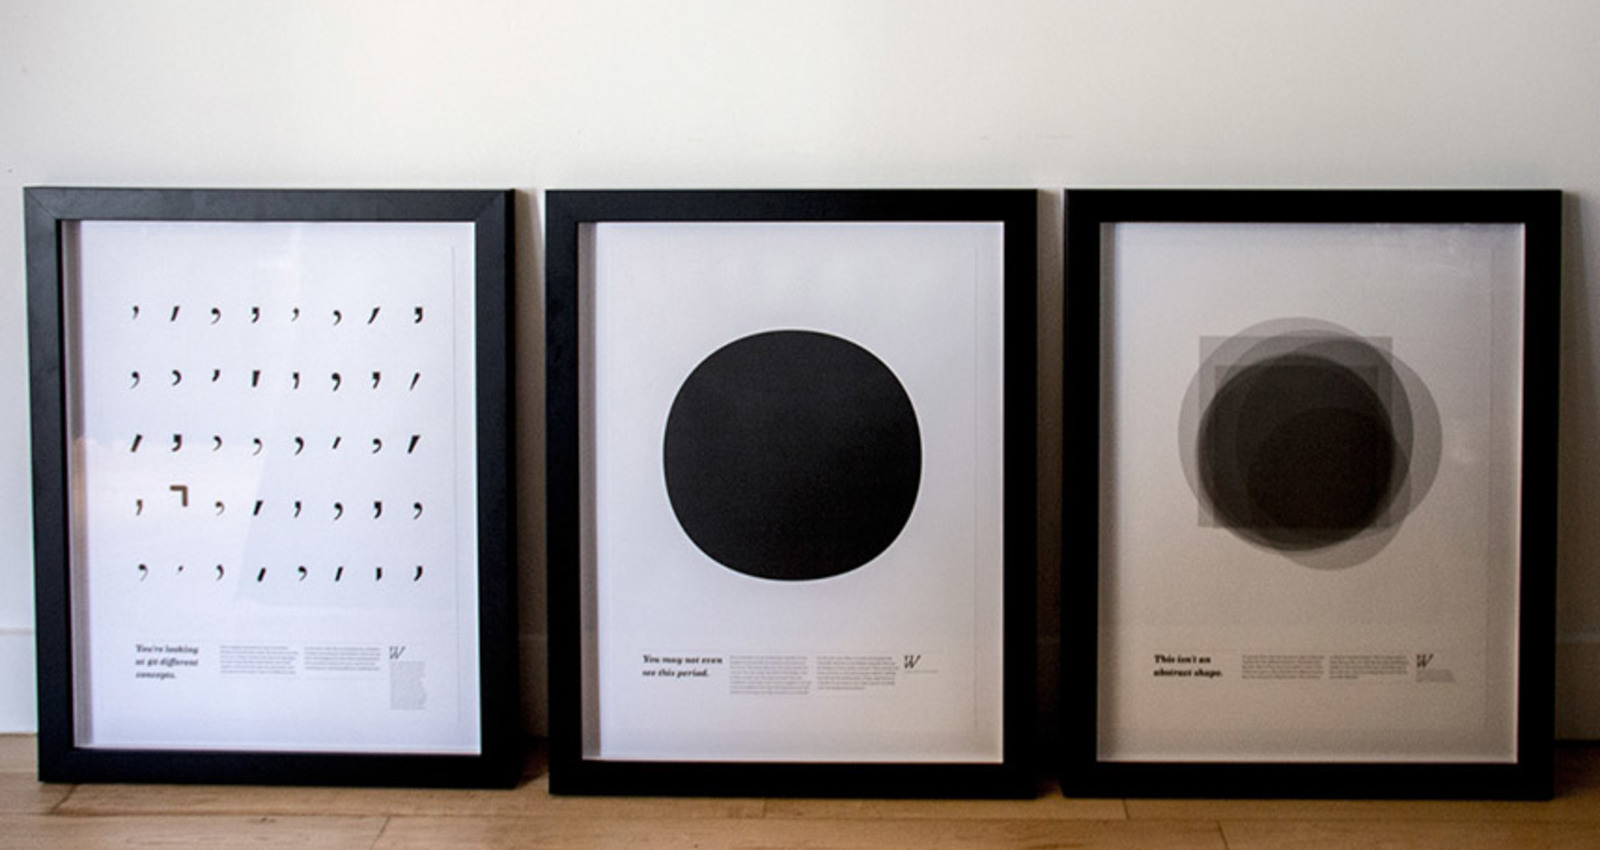 Typeworth Educational Series Posters